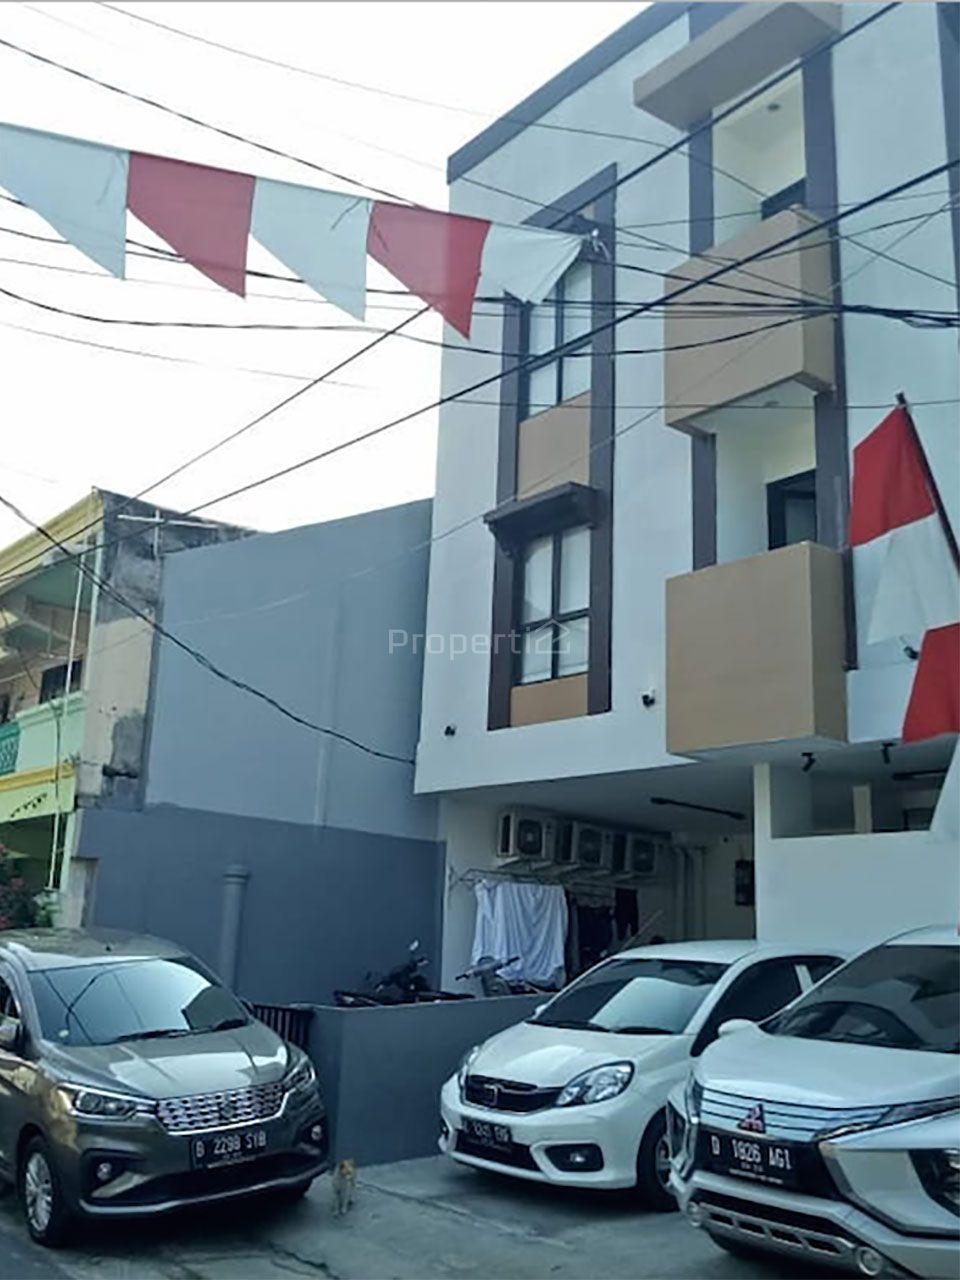 New Boarding House at Tebet, DKI Jakarta